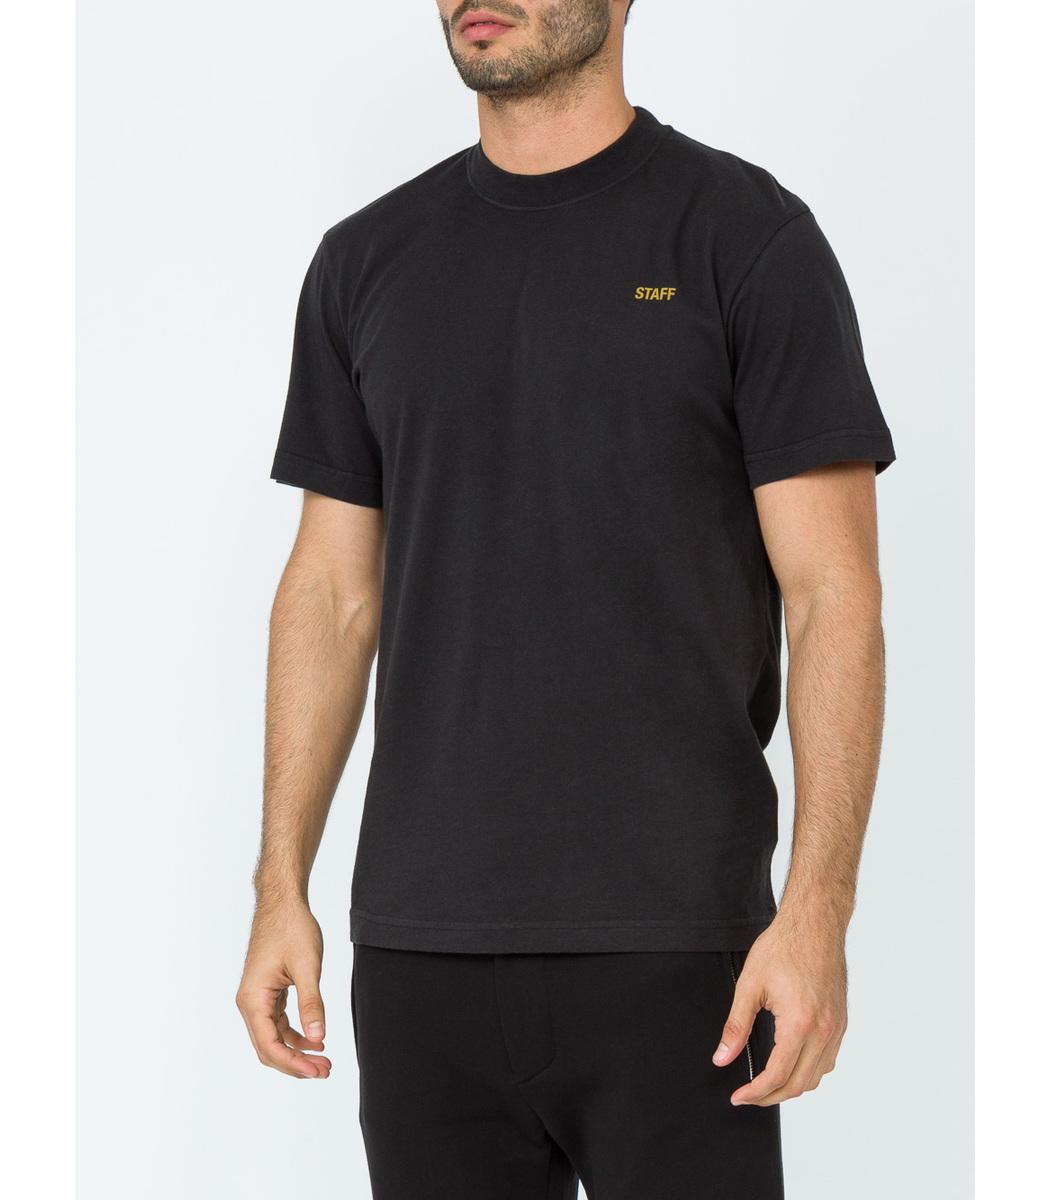 Vetements Staff Crew Neck Tee Shirt - Black Cotton Tee Shirt